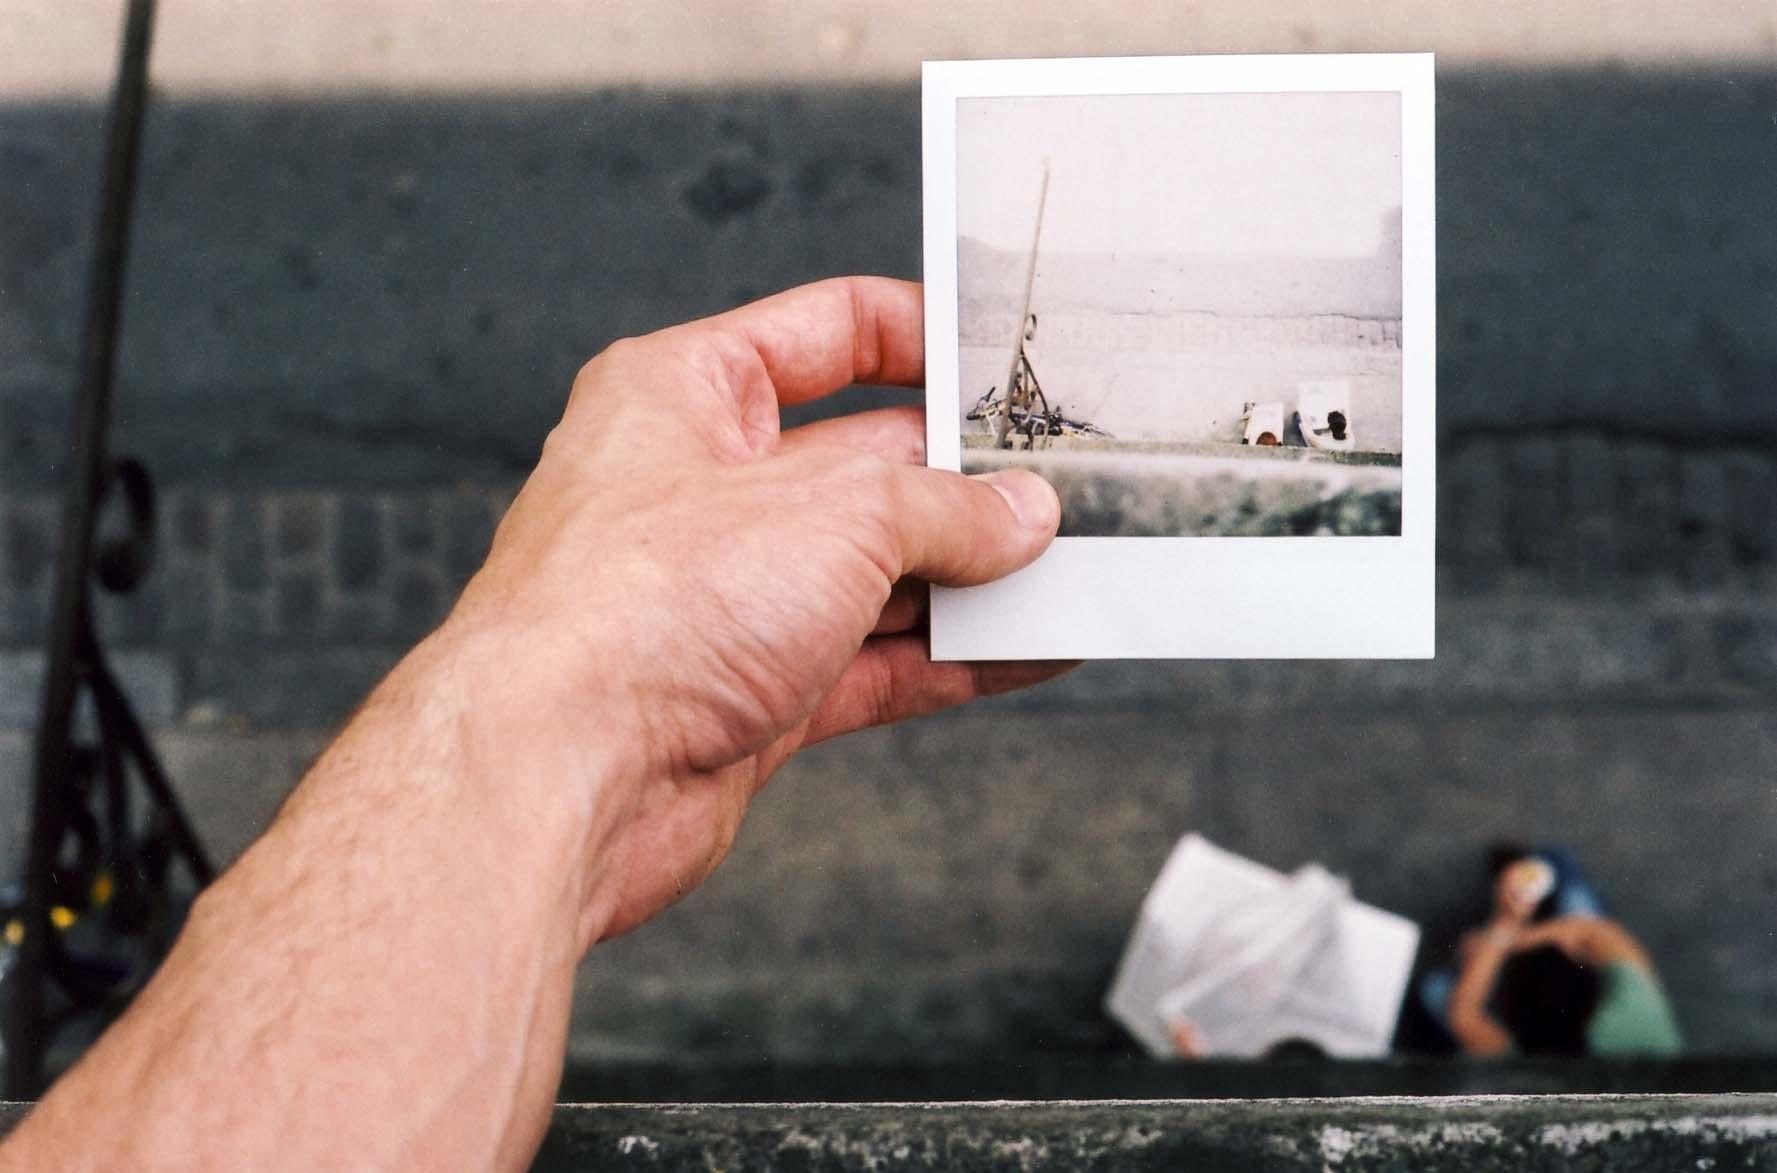 Macchina fotografica istantanea: quale comprare?